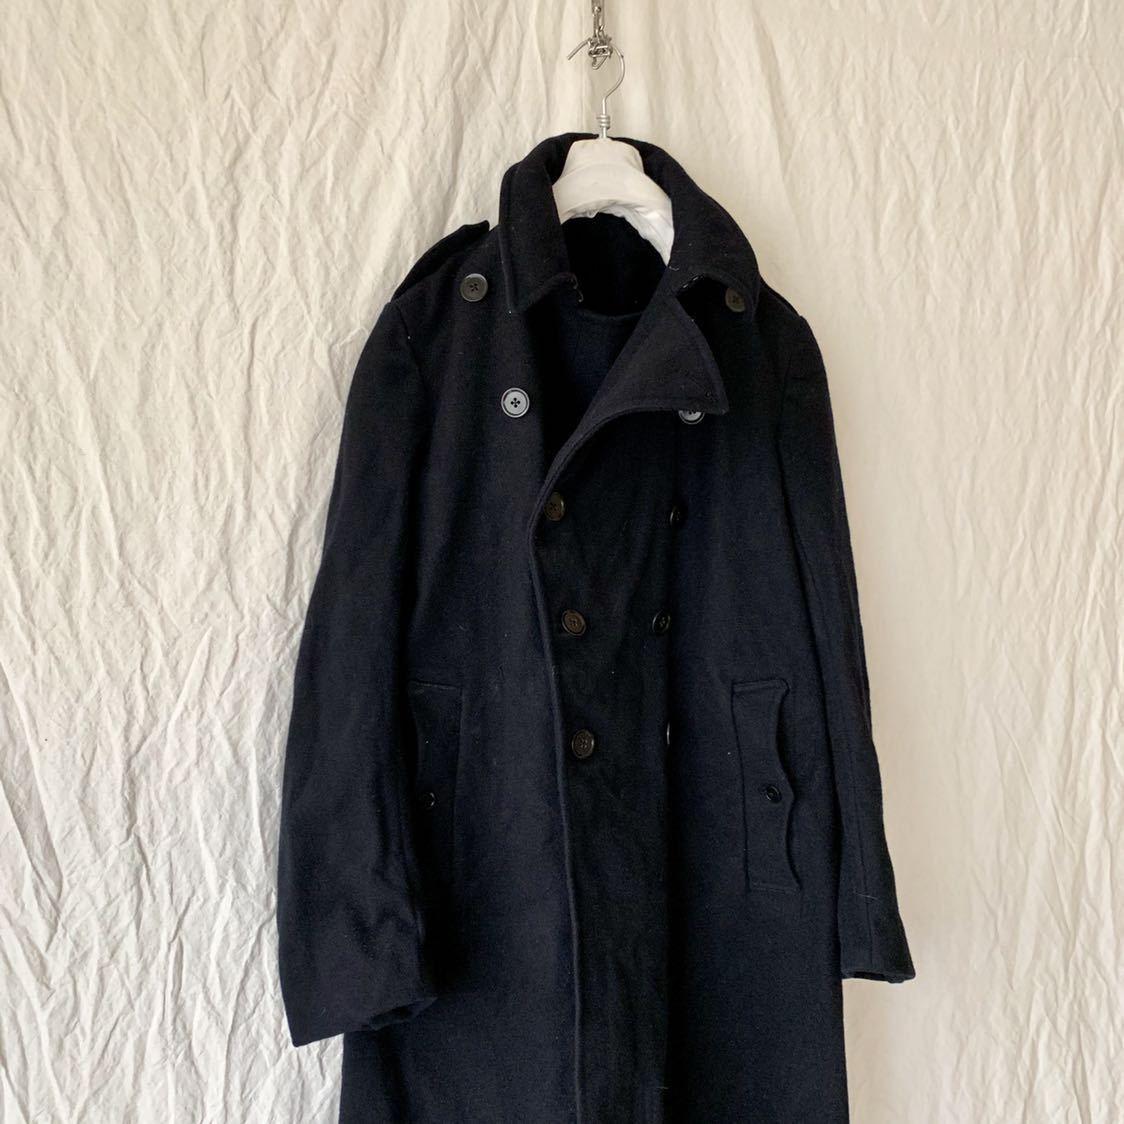 40s 50s イギリス ビンテージ ヘビーメルトン ファイヤーマン コート ウール ワーク 濃紺 ピーコート ダッフル _画像2